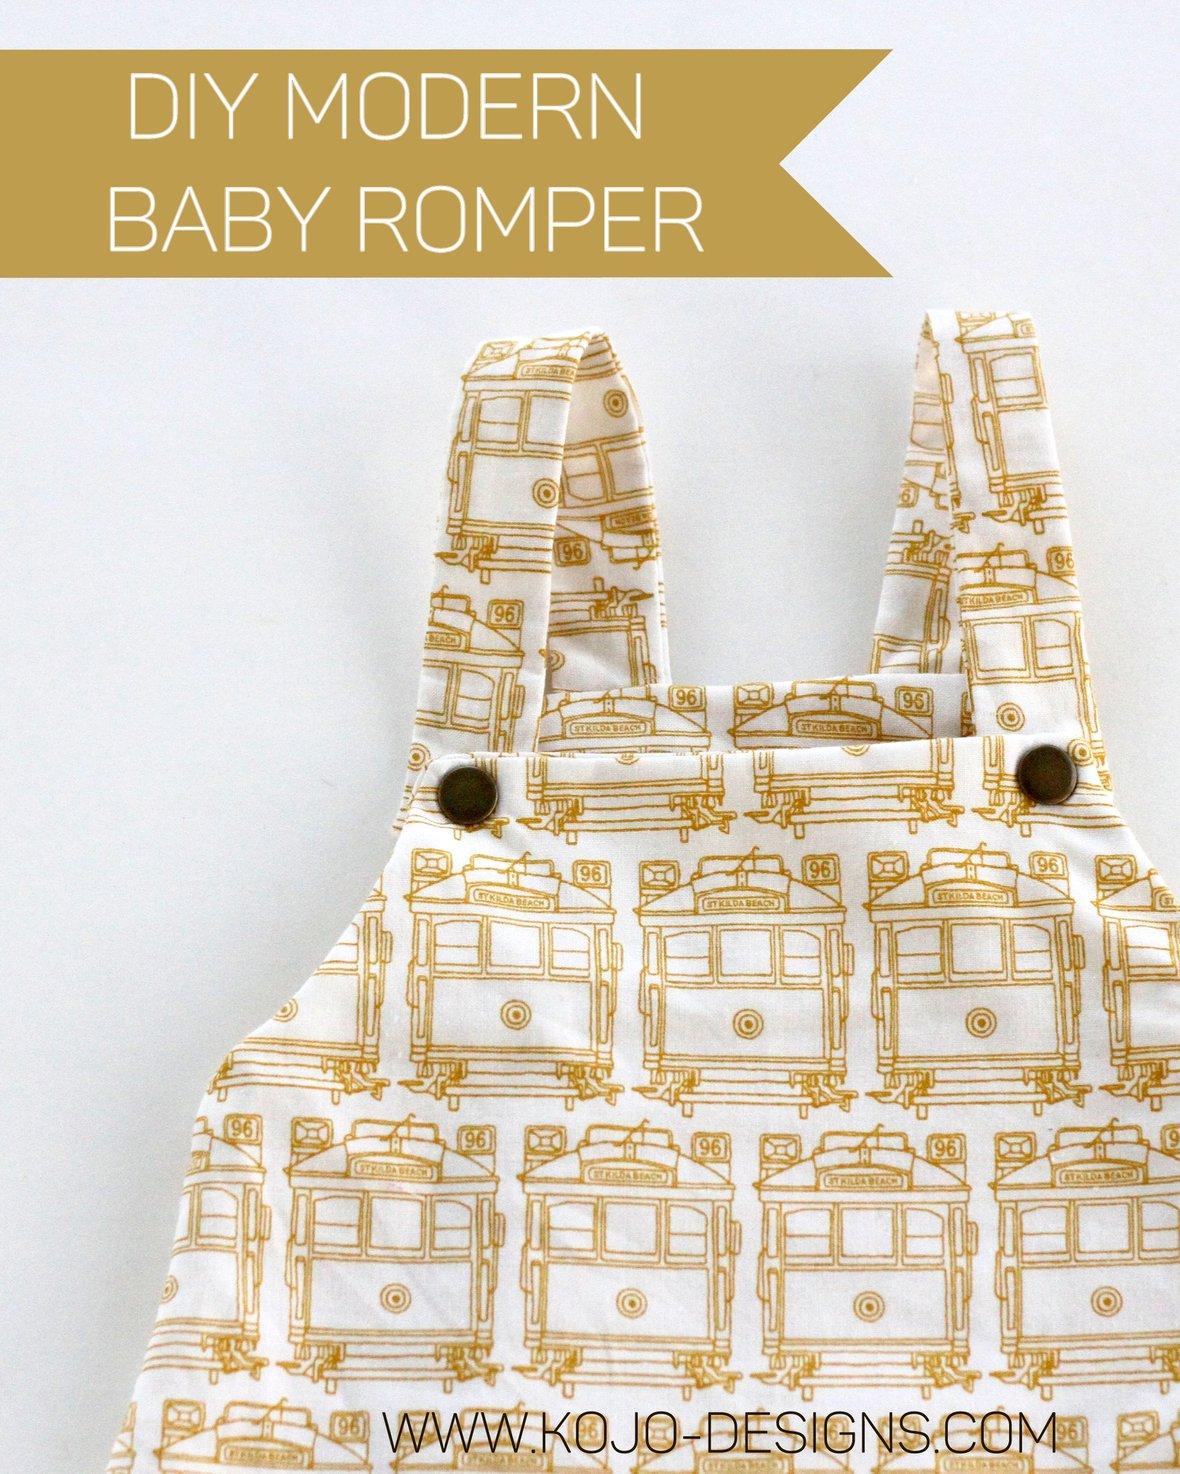 Kojo-designs- diy baby romper